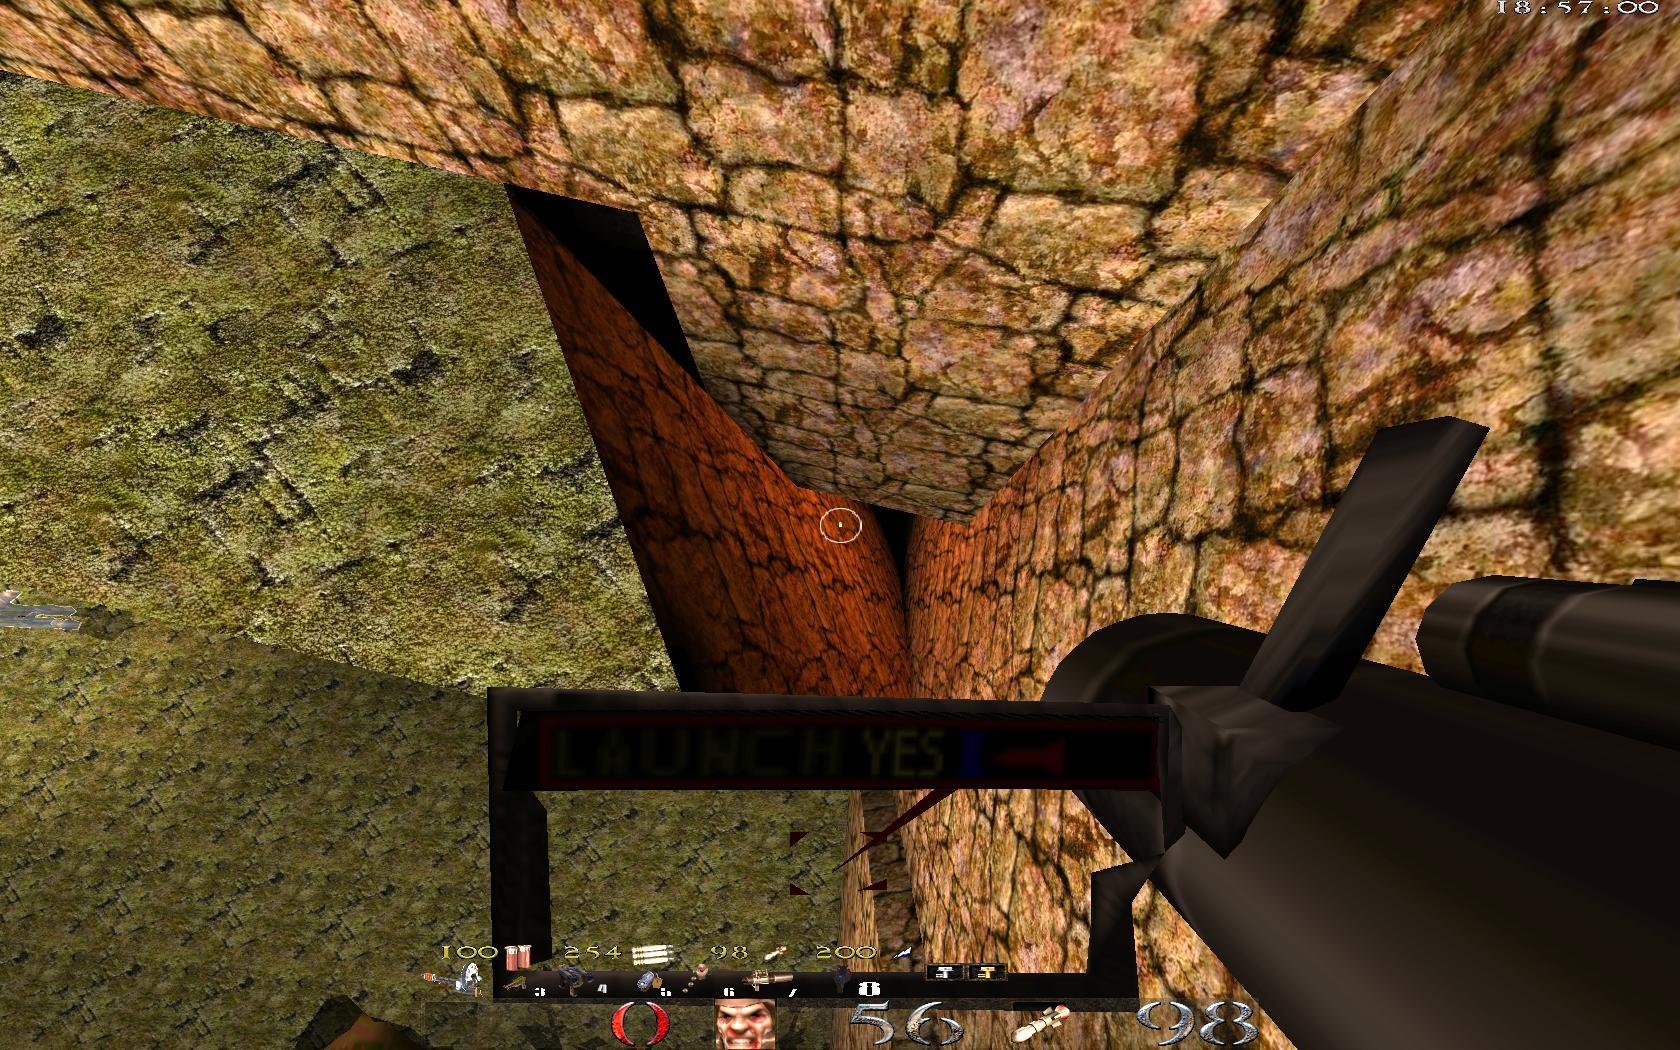 Quake Mountain addon for Quake 1 (qrack port) - здесь надо поставить clip-браш - Quake Мод